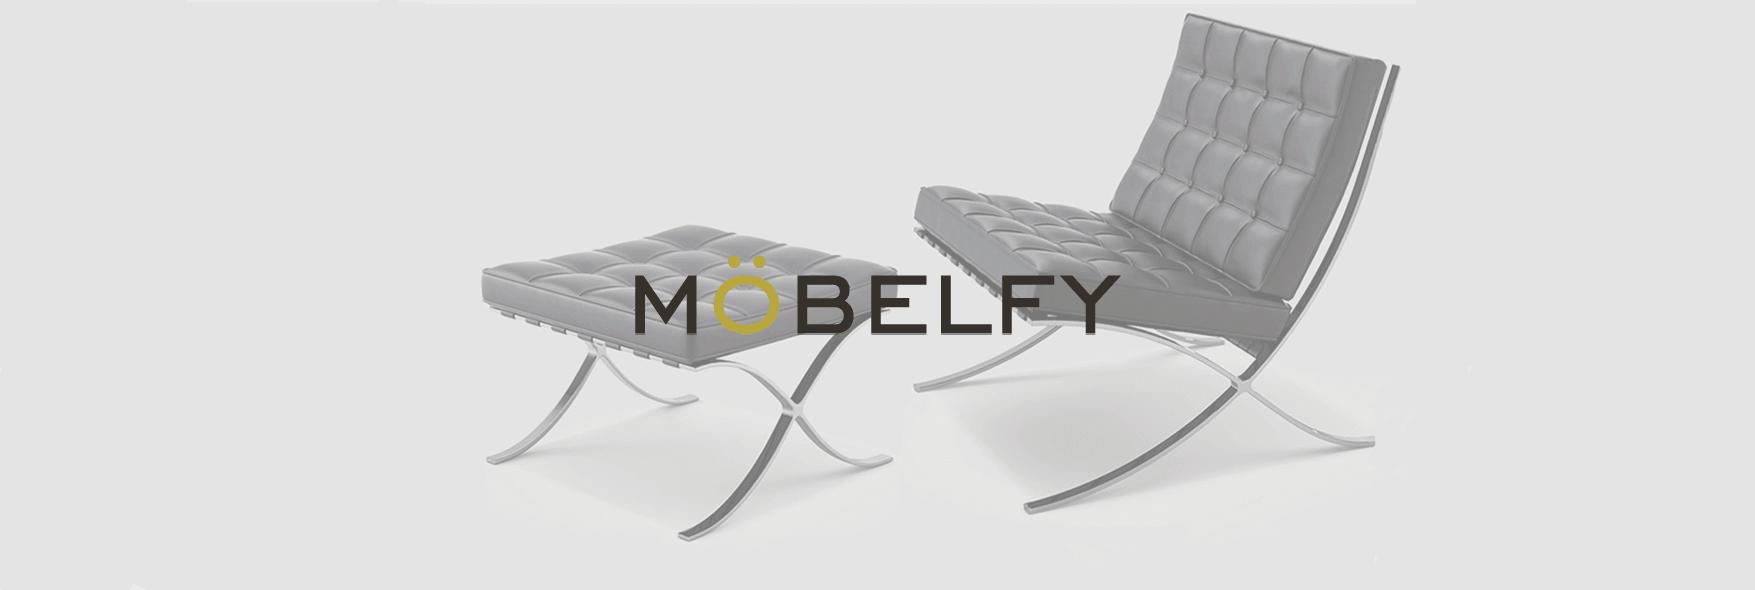 Mobelfy fondo